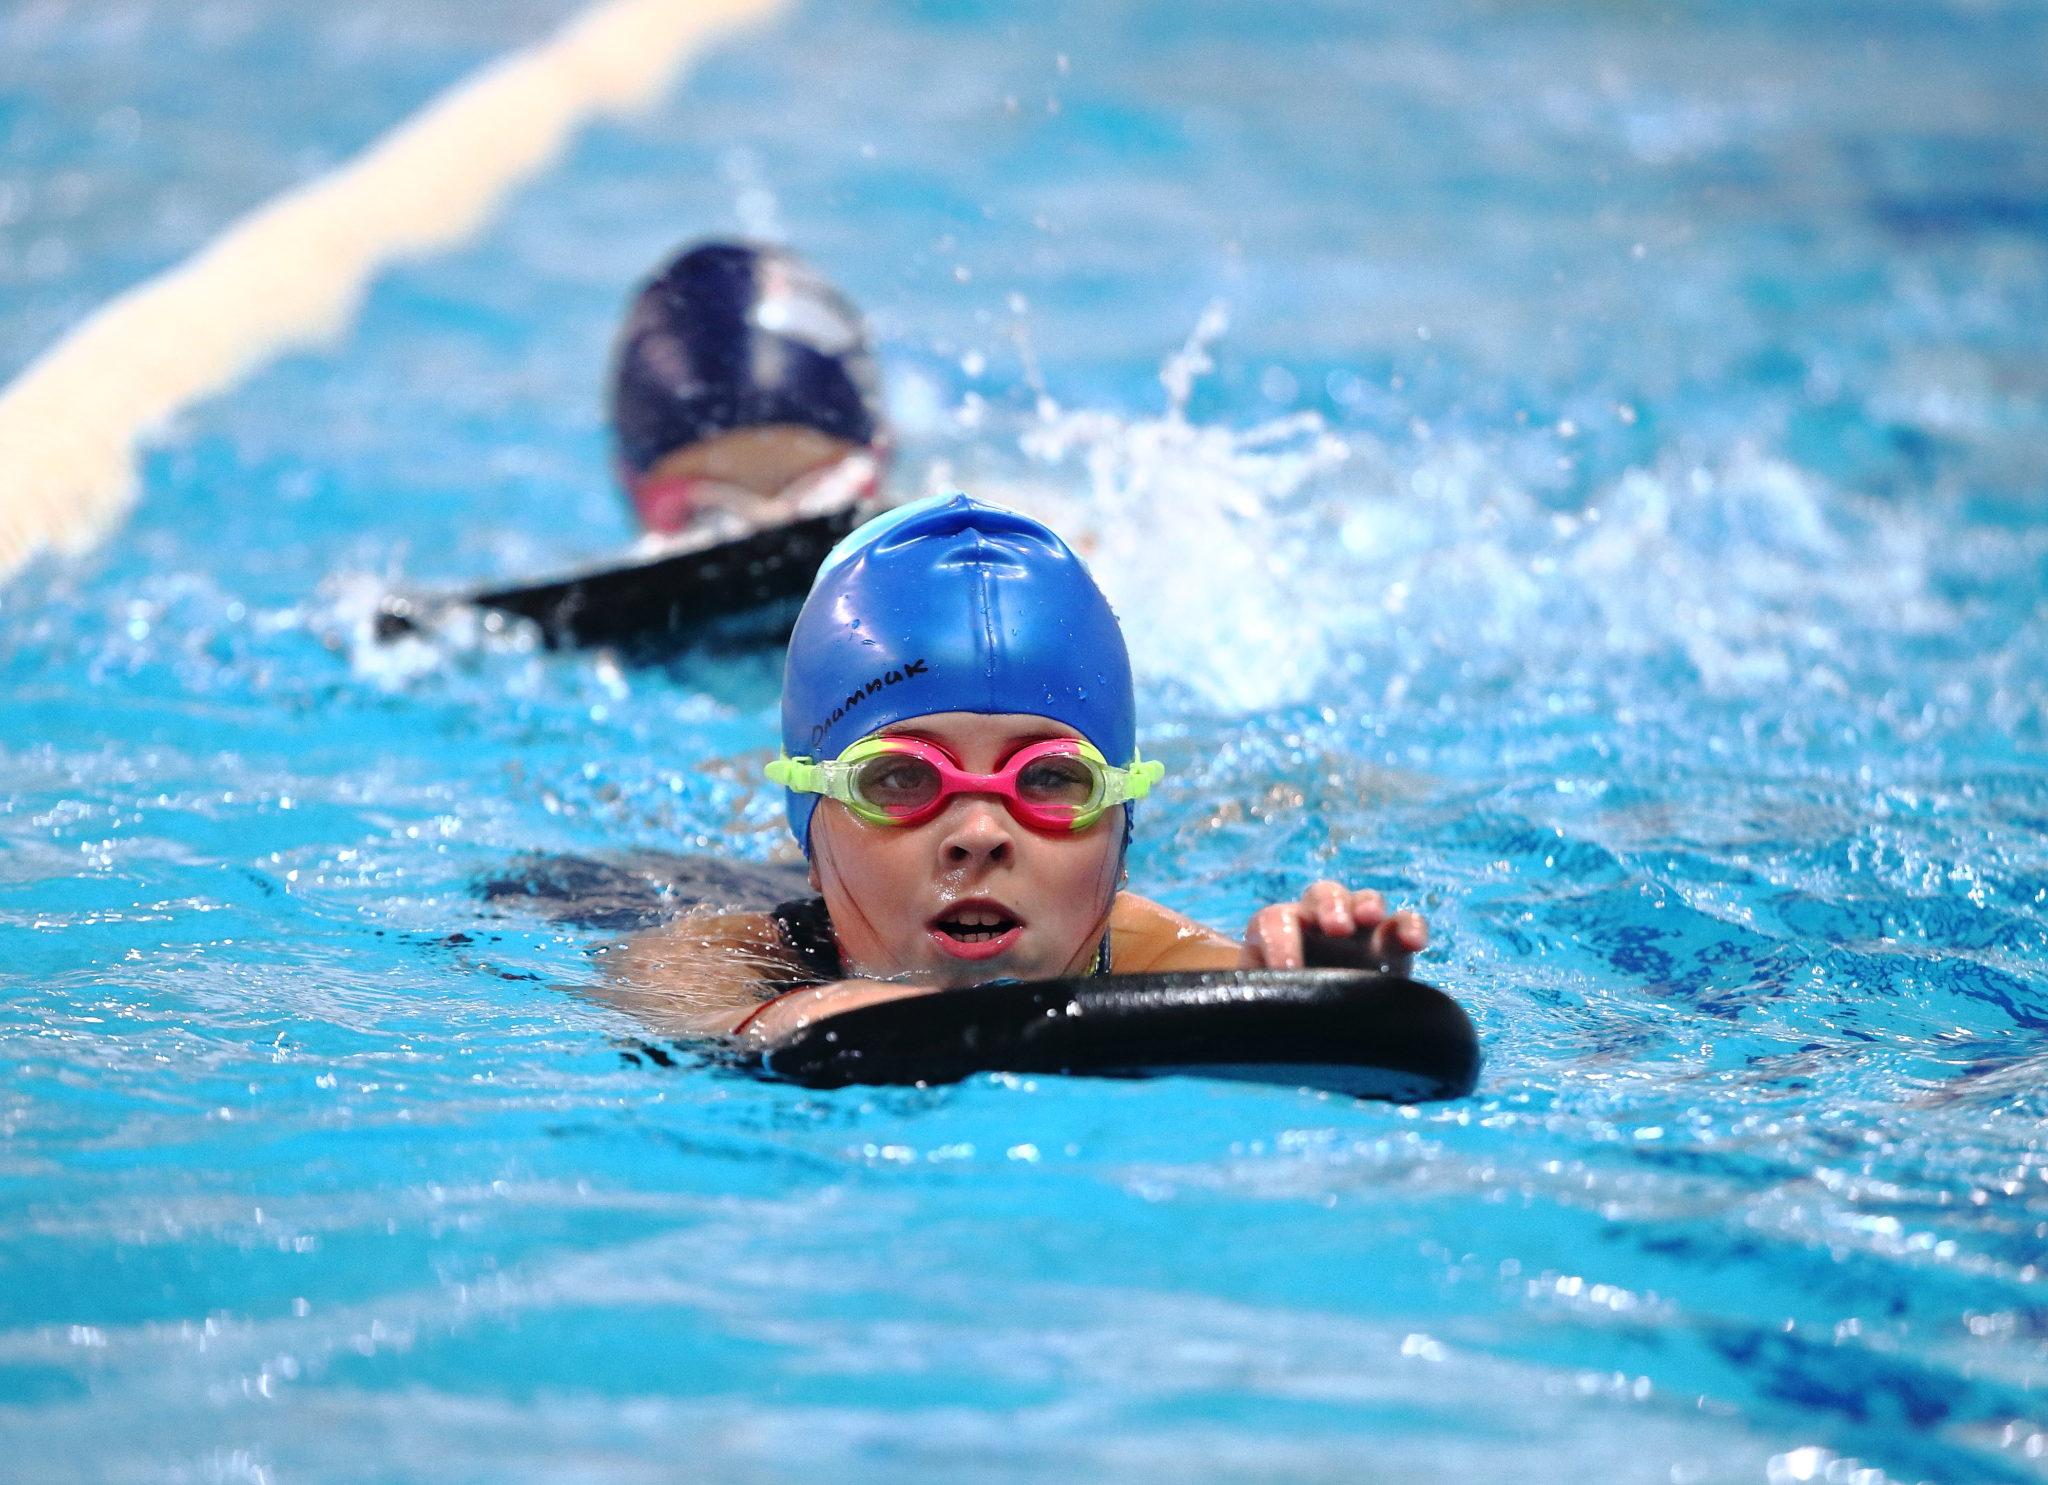 Плавание, 1 занятие в неделю